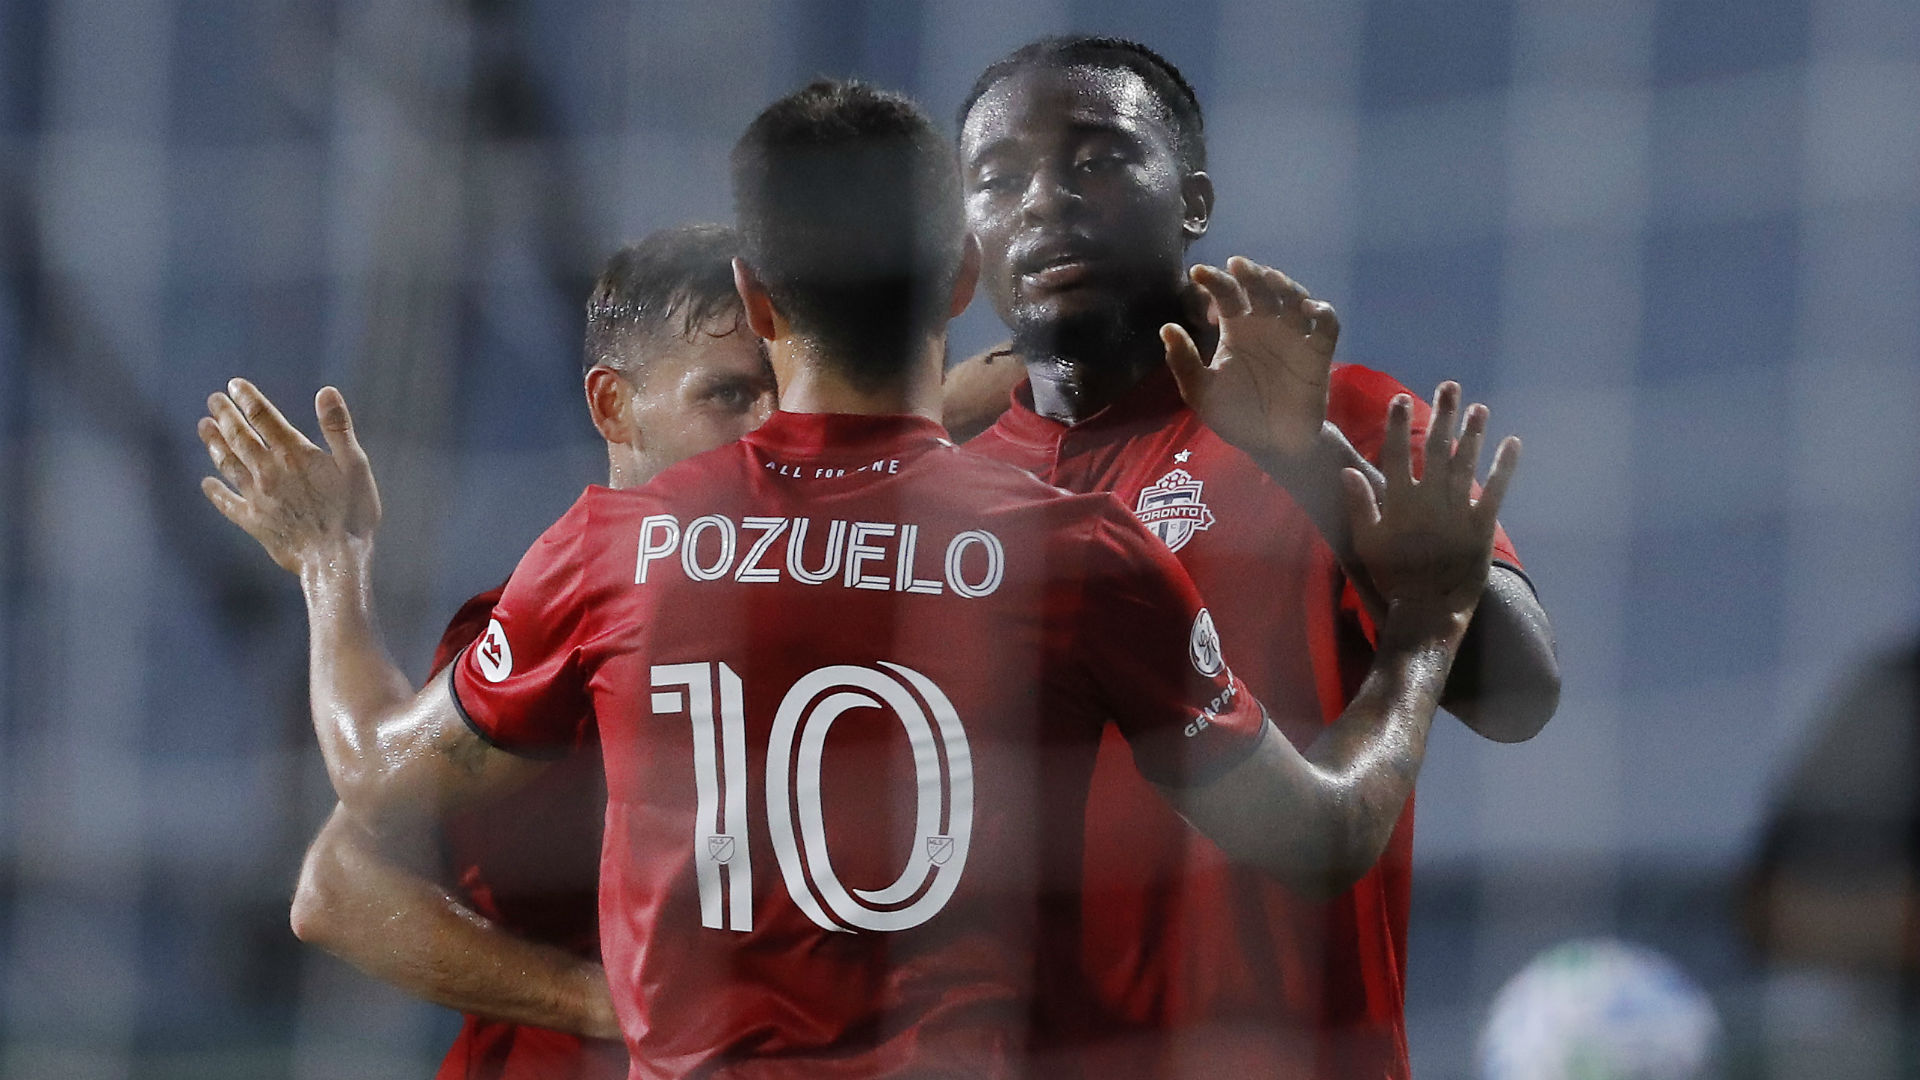 Akinola's hat-trick powers Toronto FC past Taider's Montreal Impact